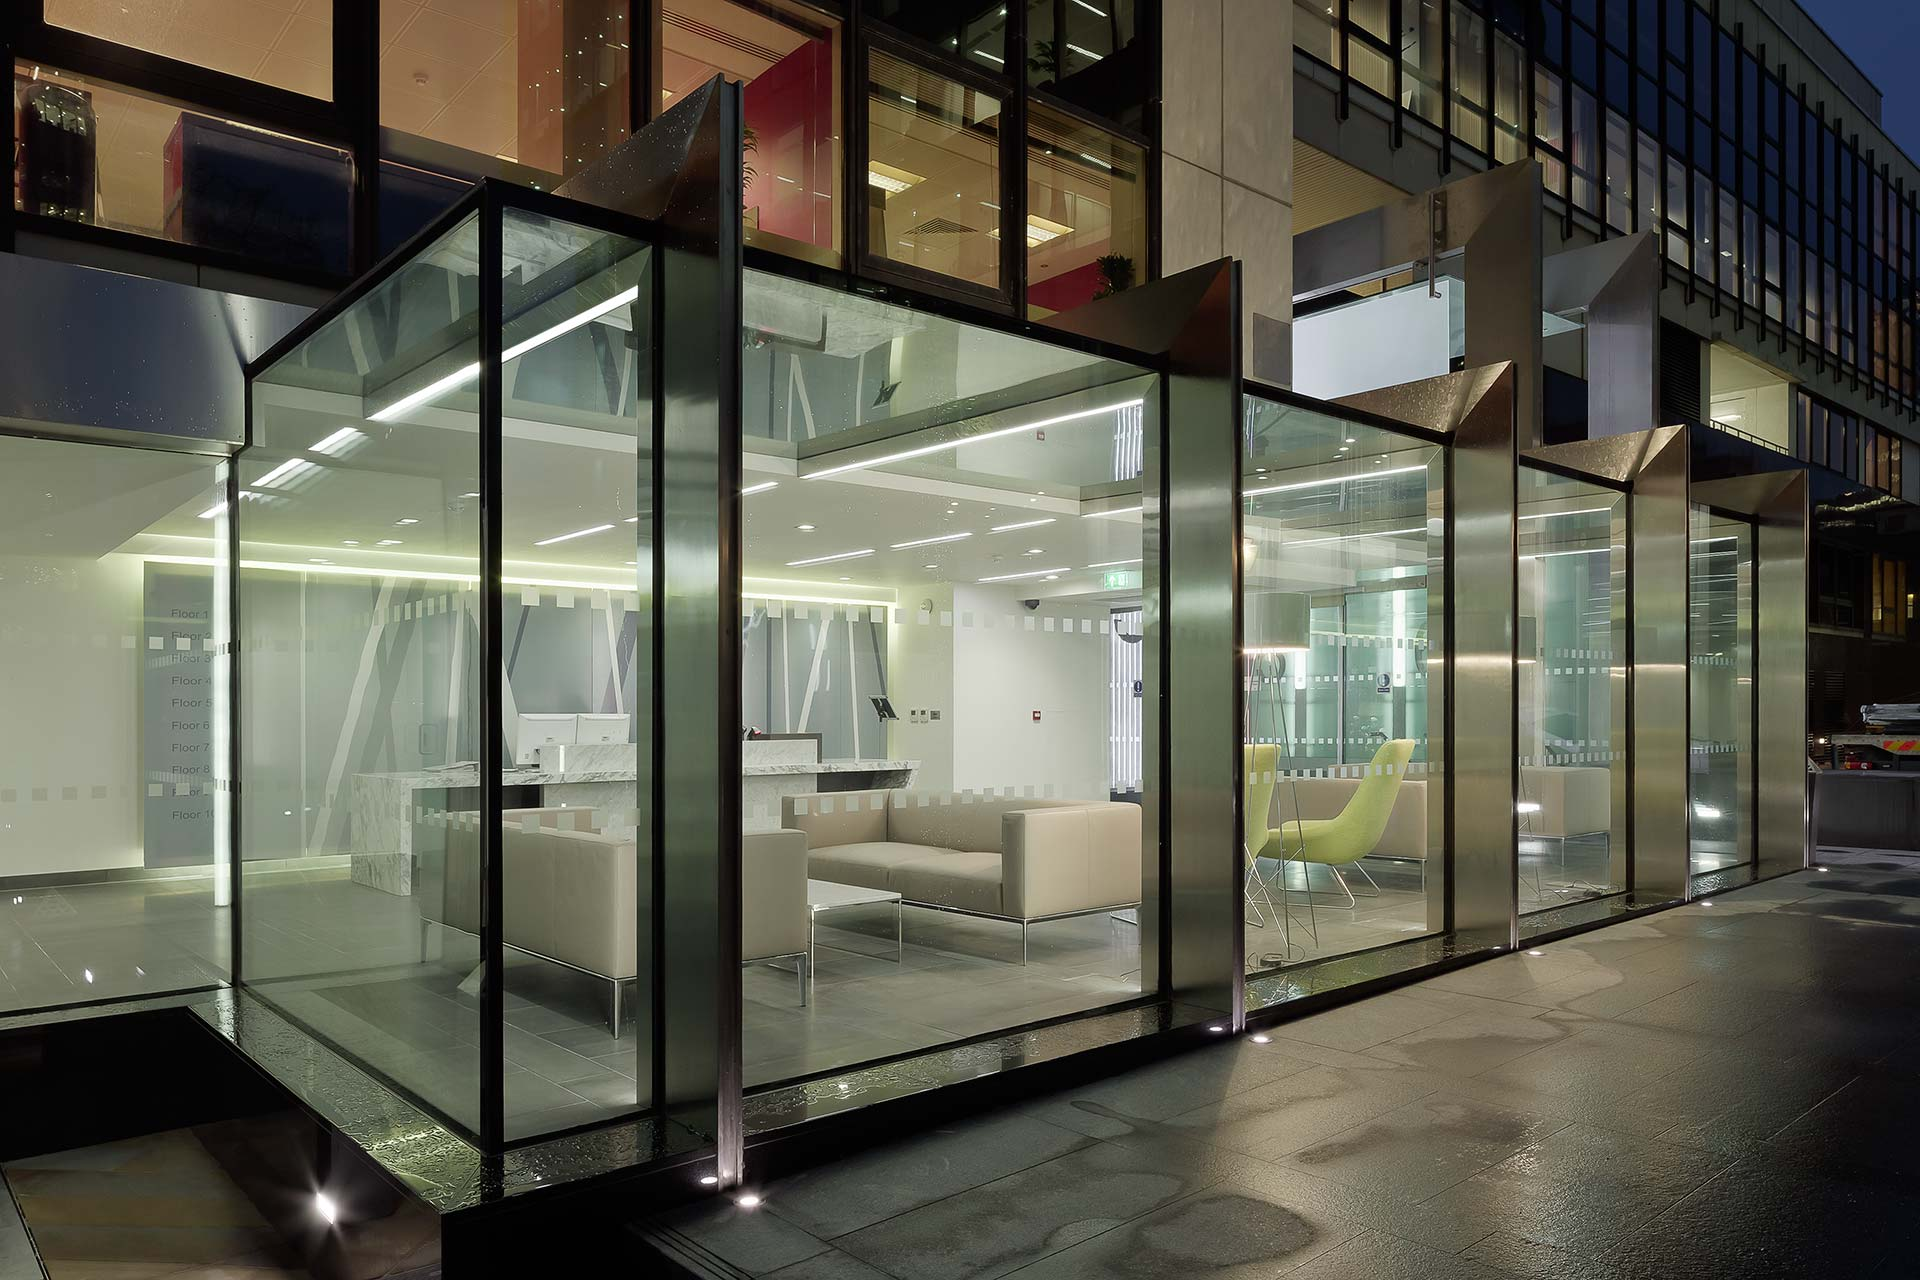 Pramerica Real Estate Investors Ltd | 55 Old Broad Street